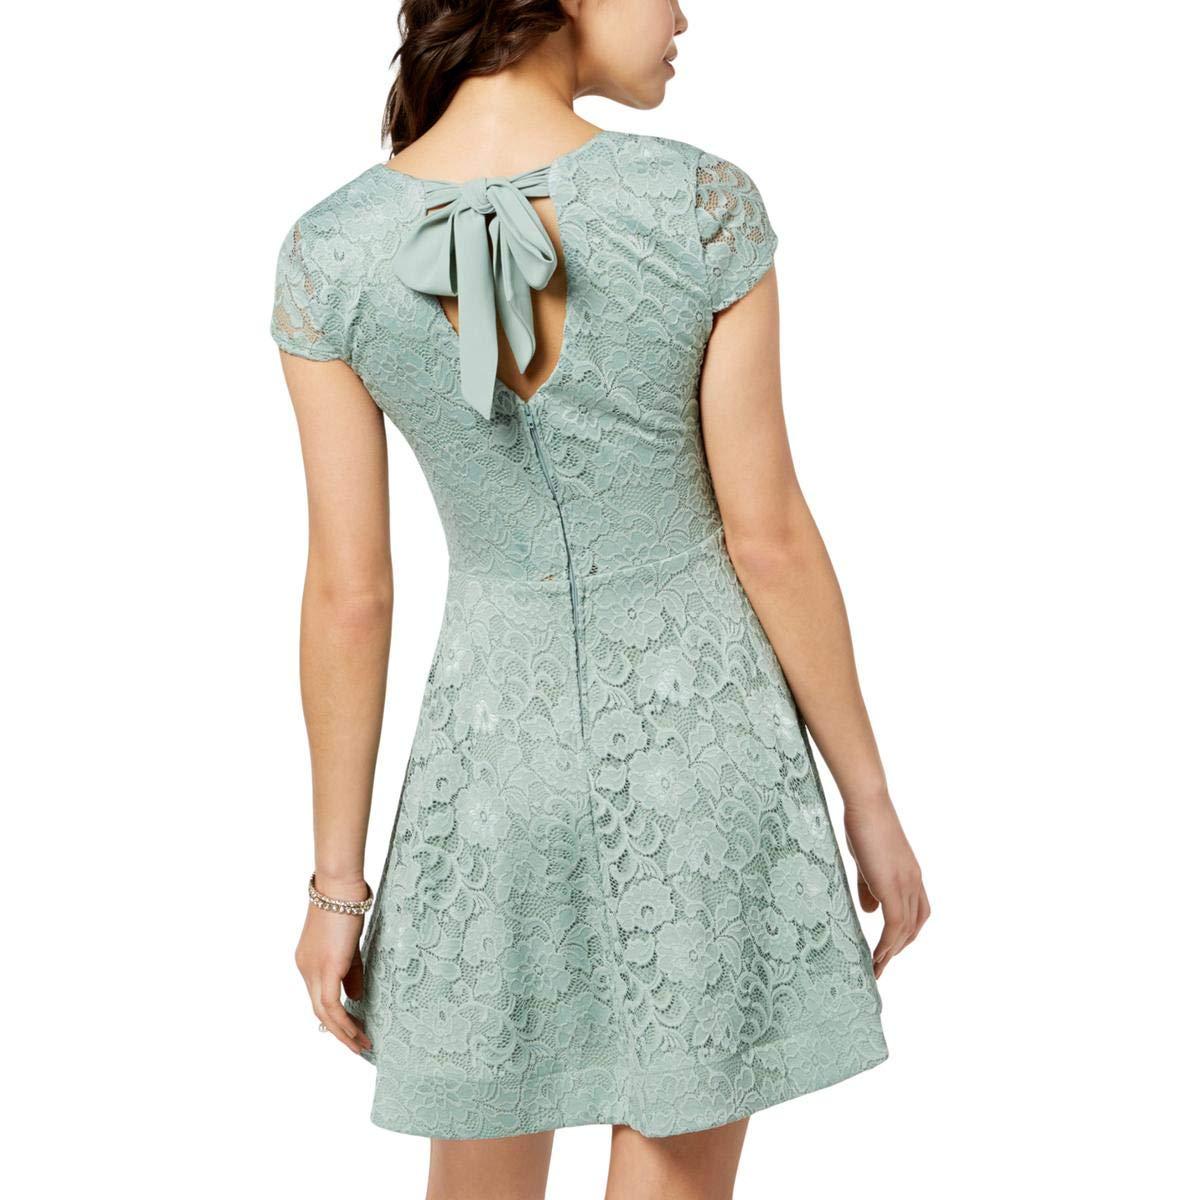 b178ec6533c429 Amazon.com: B. Darlin Womens Juniors Lace Fit & Flare Casual Dress: Clothing